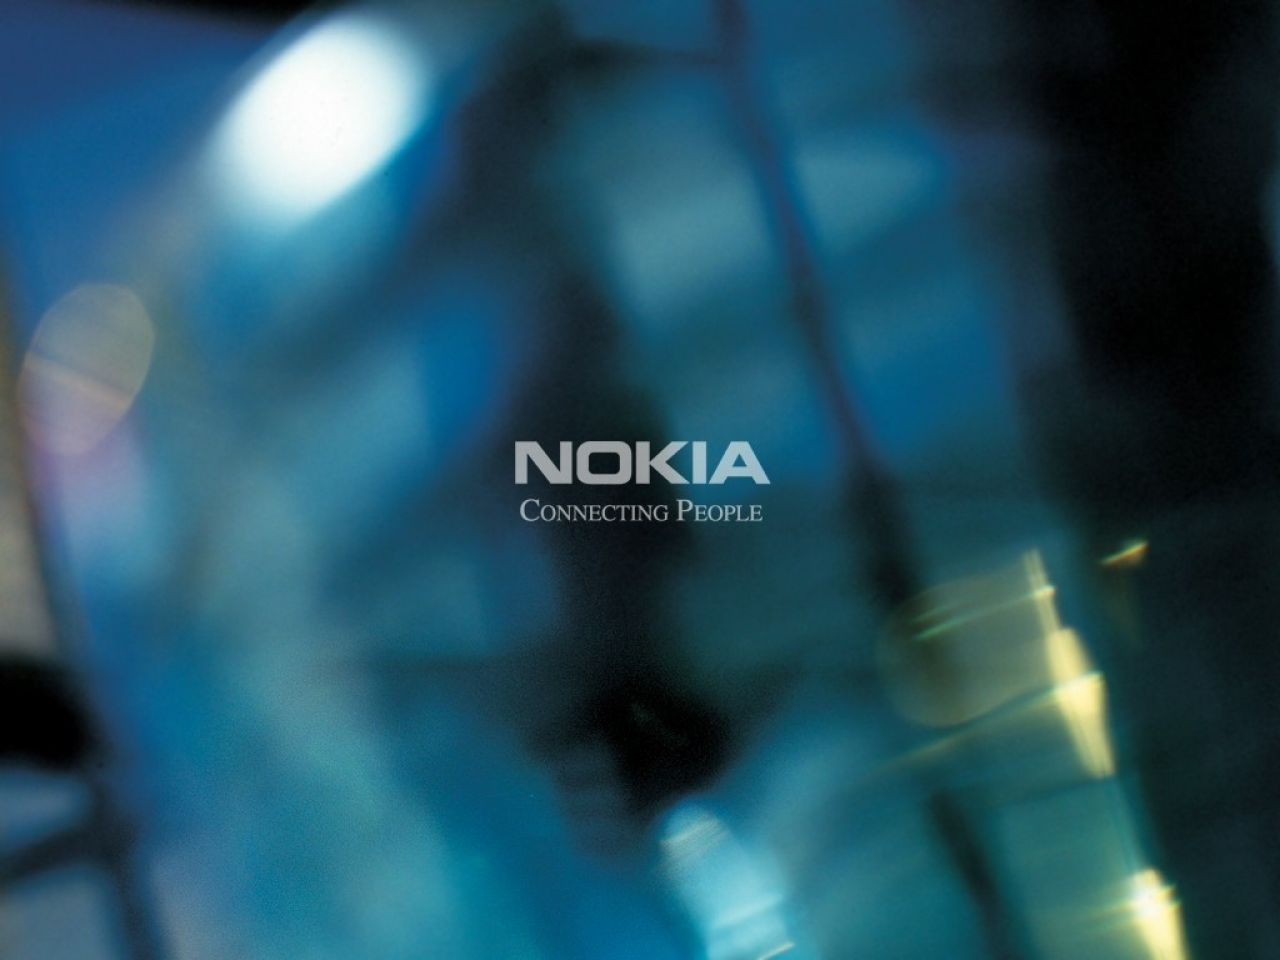 Cool Nokia Wallpapers: Nokia Mobile Phone Wallpaper